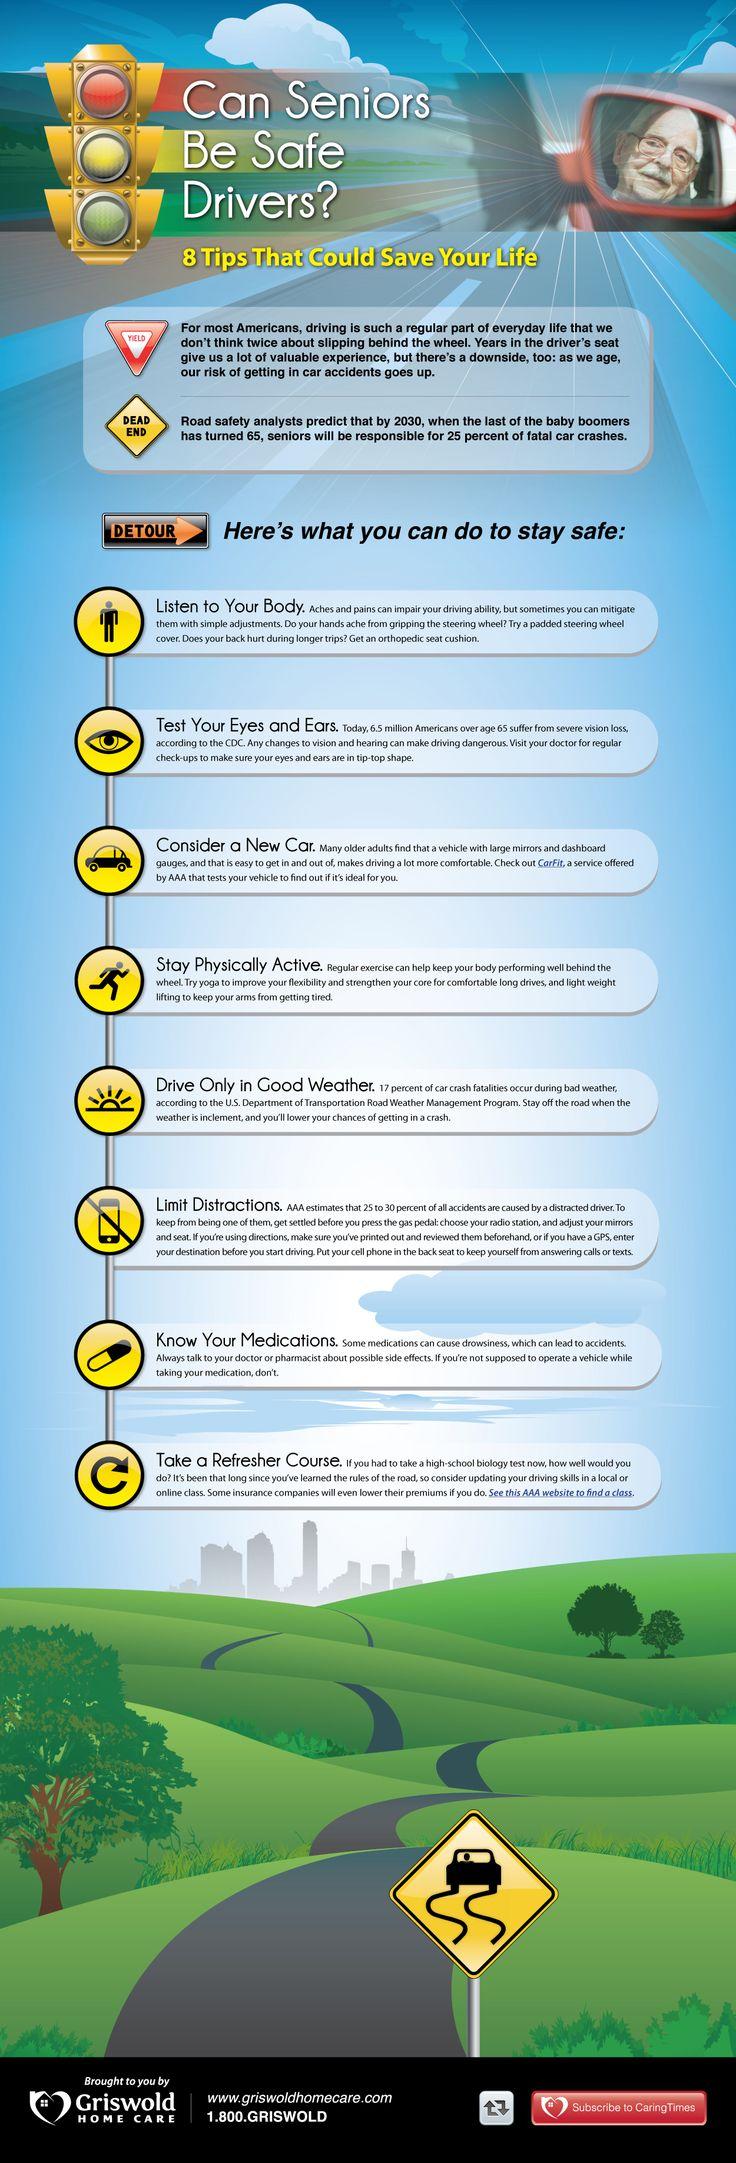 8 driving tips for seniors #SafeDriving #infographic